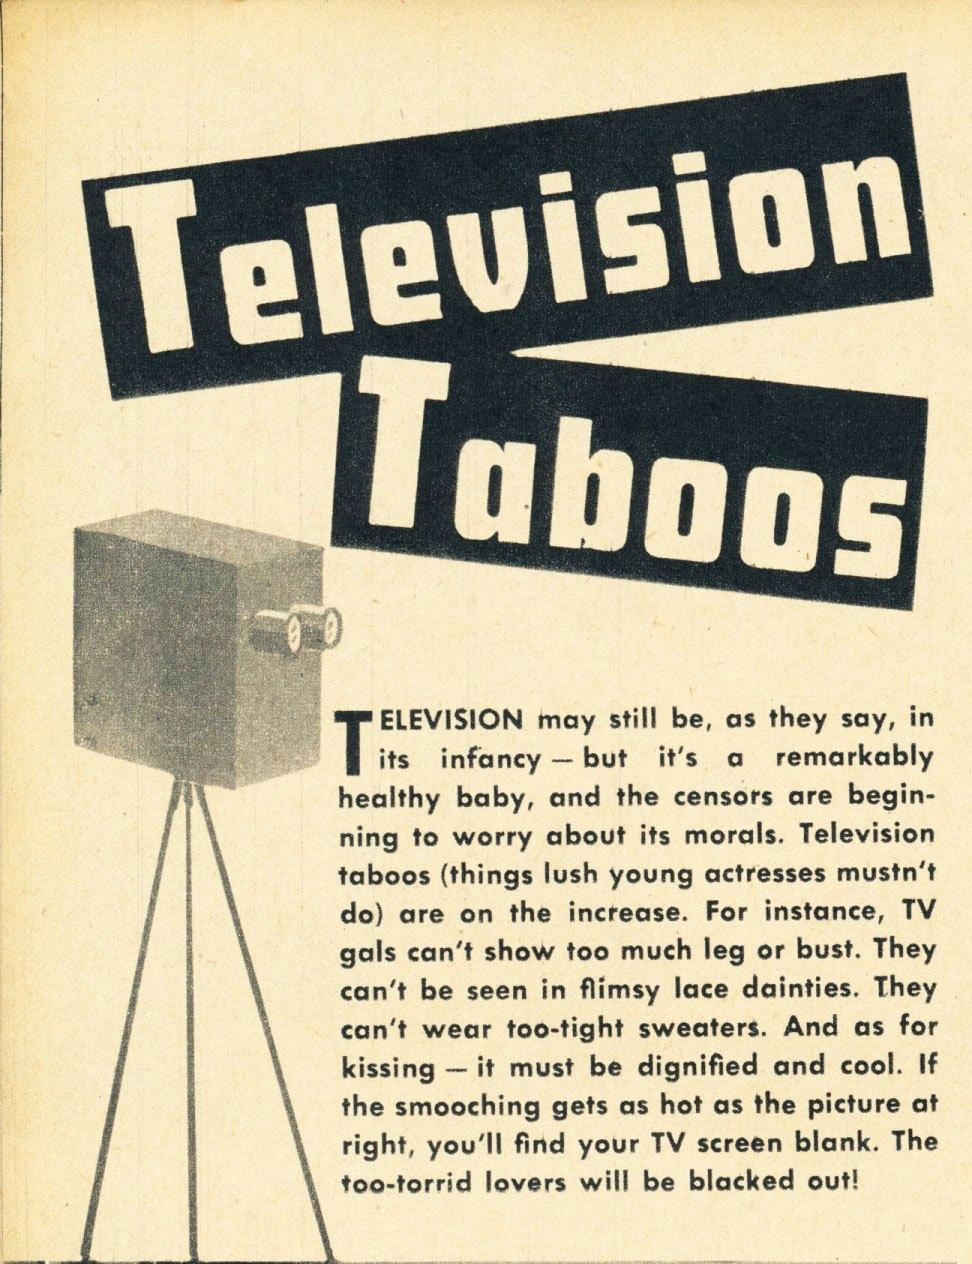 television_taboos.jpg